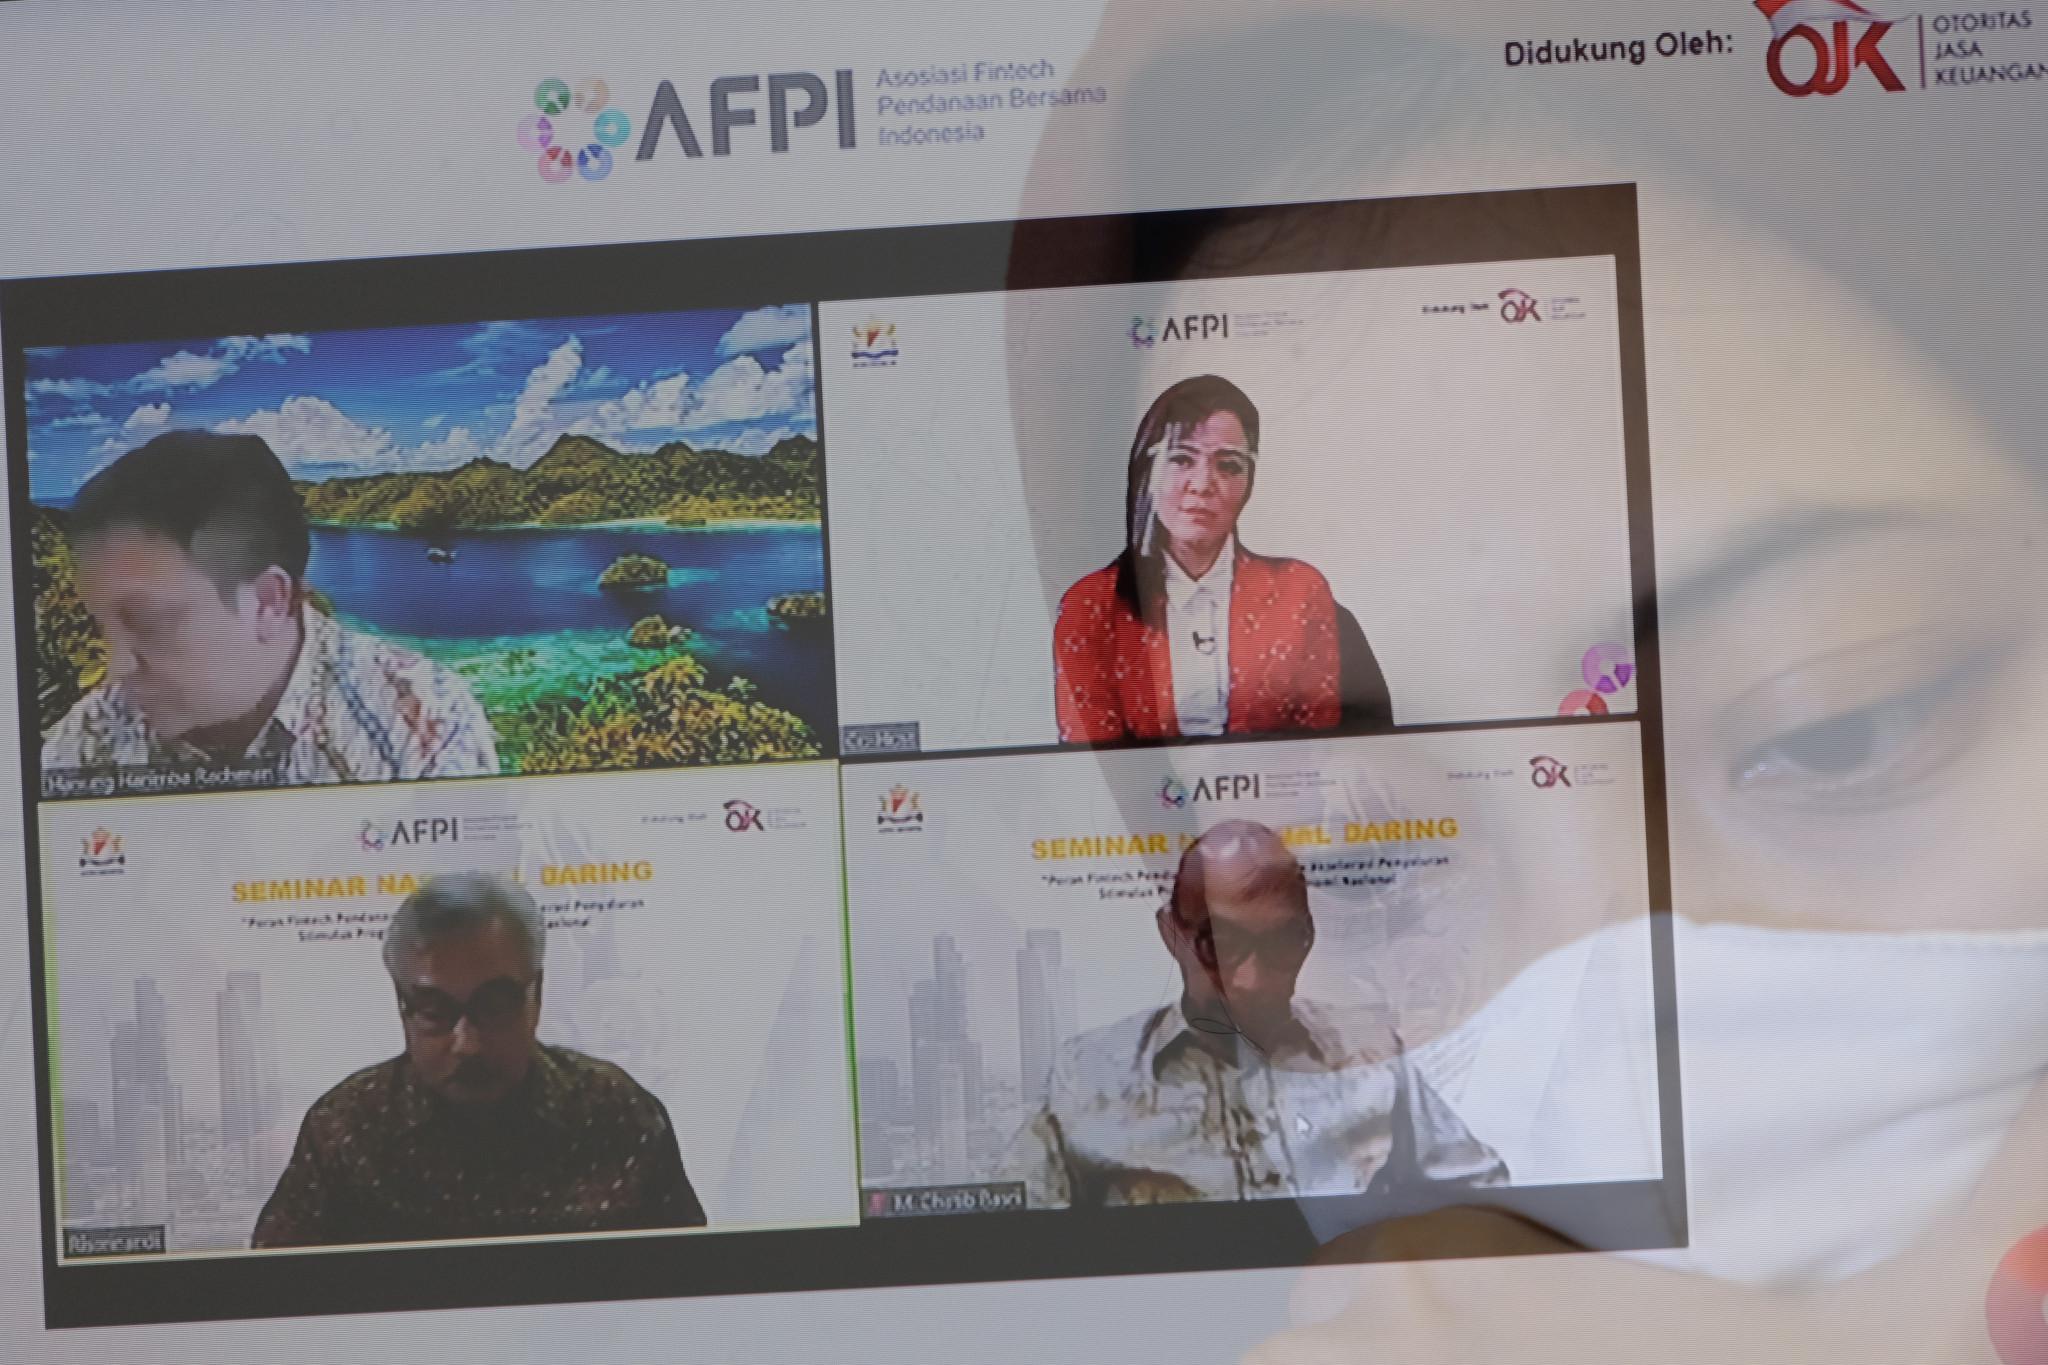 AFPI dan Kadin Indonesia: Fintech Lending Siap Bantu ...